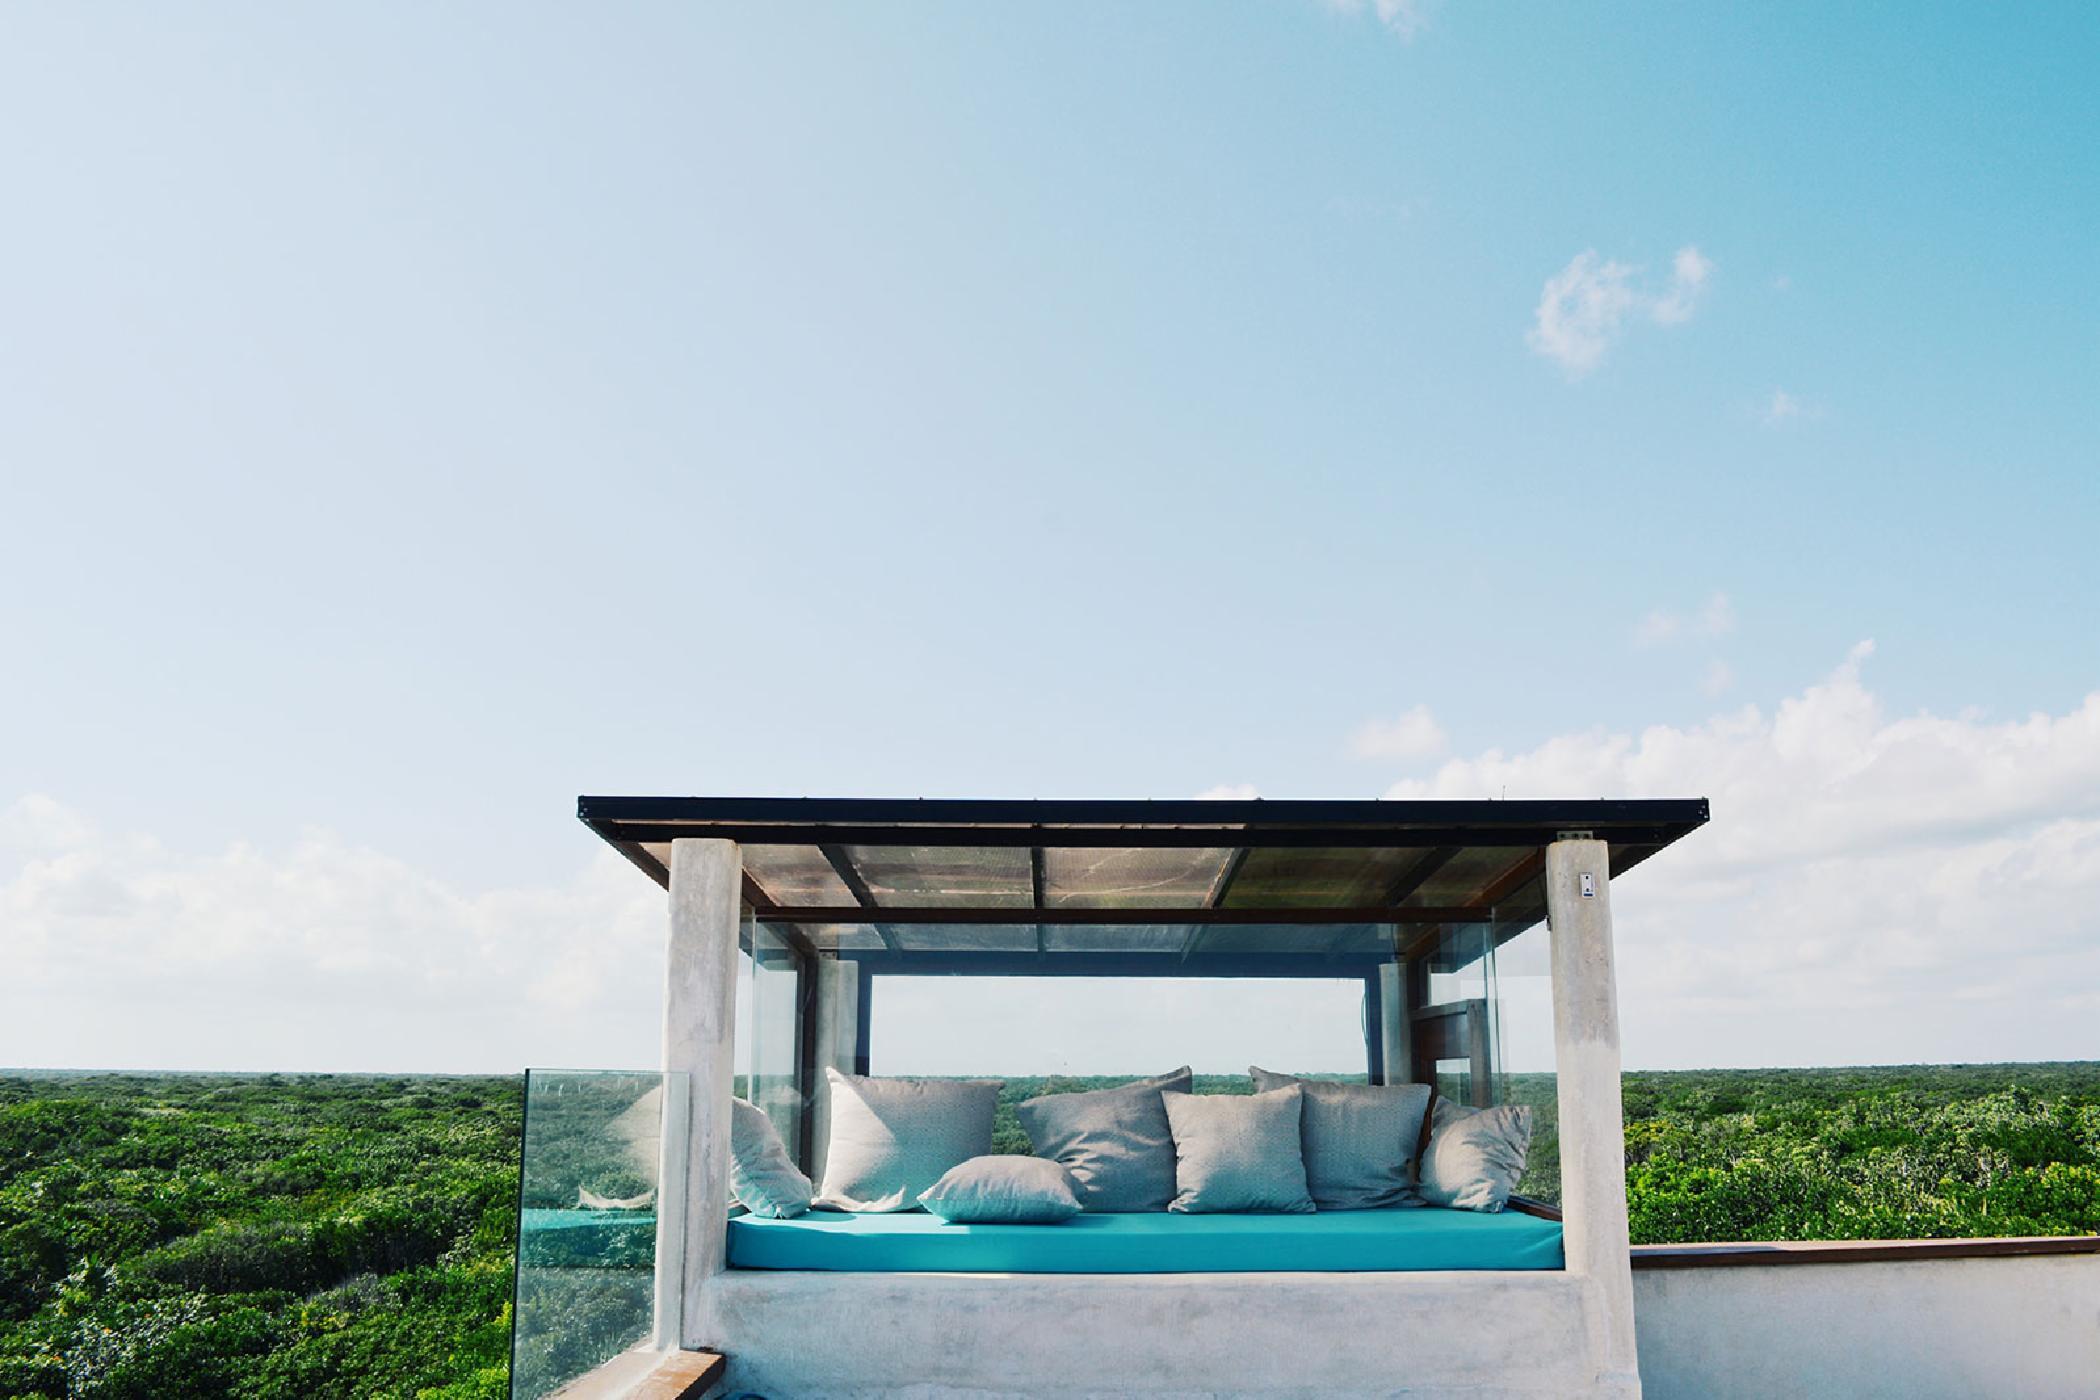 Maya_Luxe_Riviera_Maya_Luxury_Villas_Experiences_Hotel_Zone_Tulum_Beach_5_Bedrooms_Casa_Palapa_19.jpg